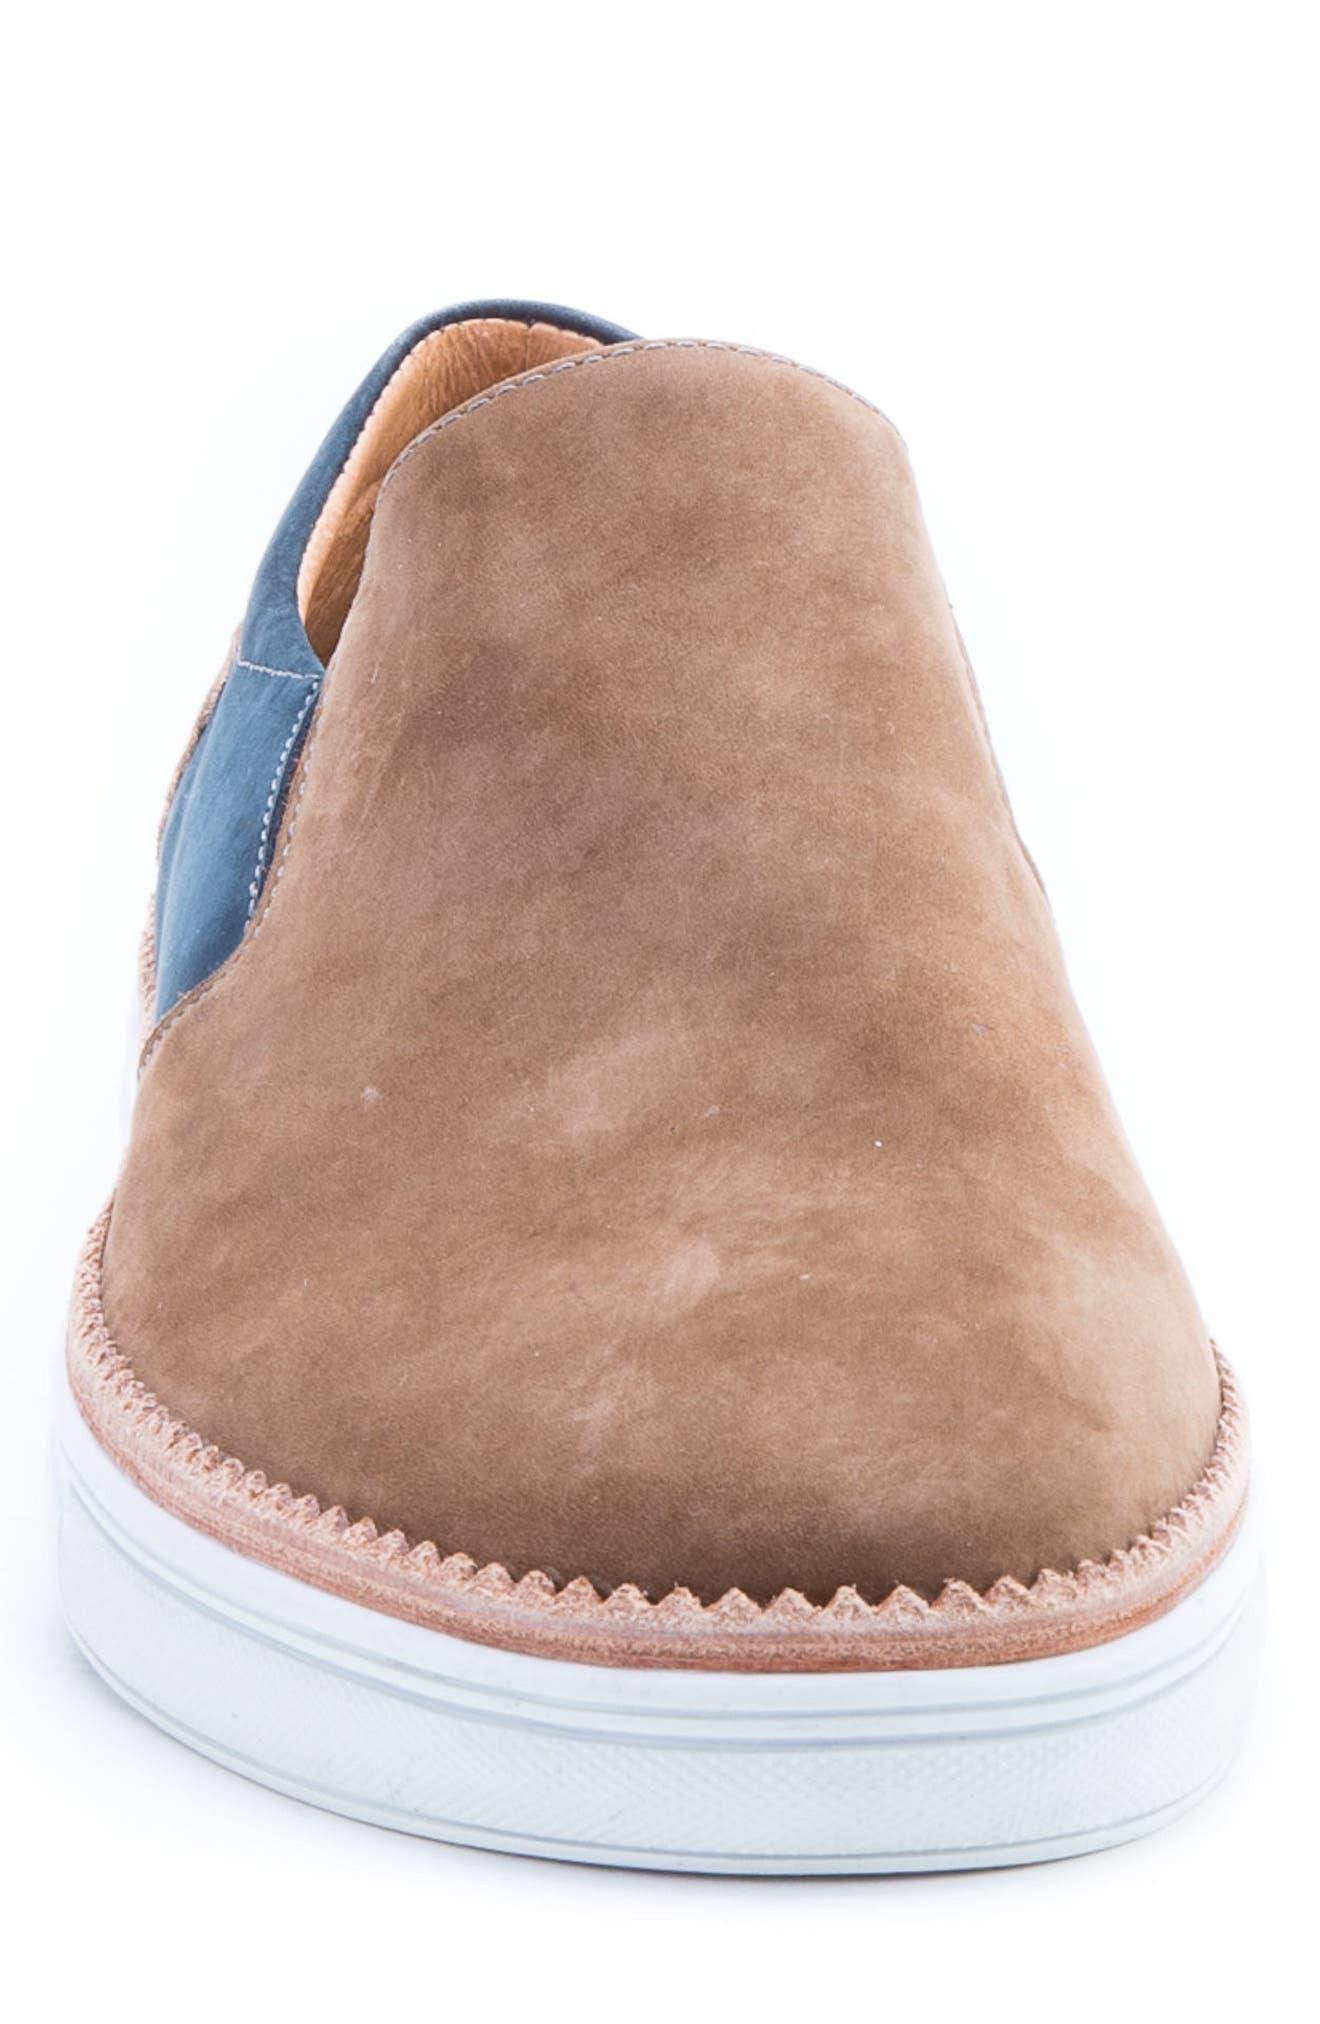 Rivera Colorblocked Slip-On Sneaker,                             Alternate thumbnail 4, color,                             COGNAC SUEDE